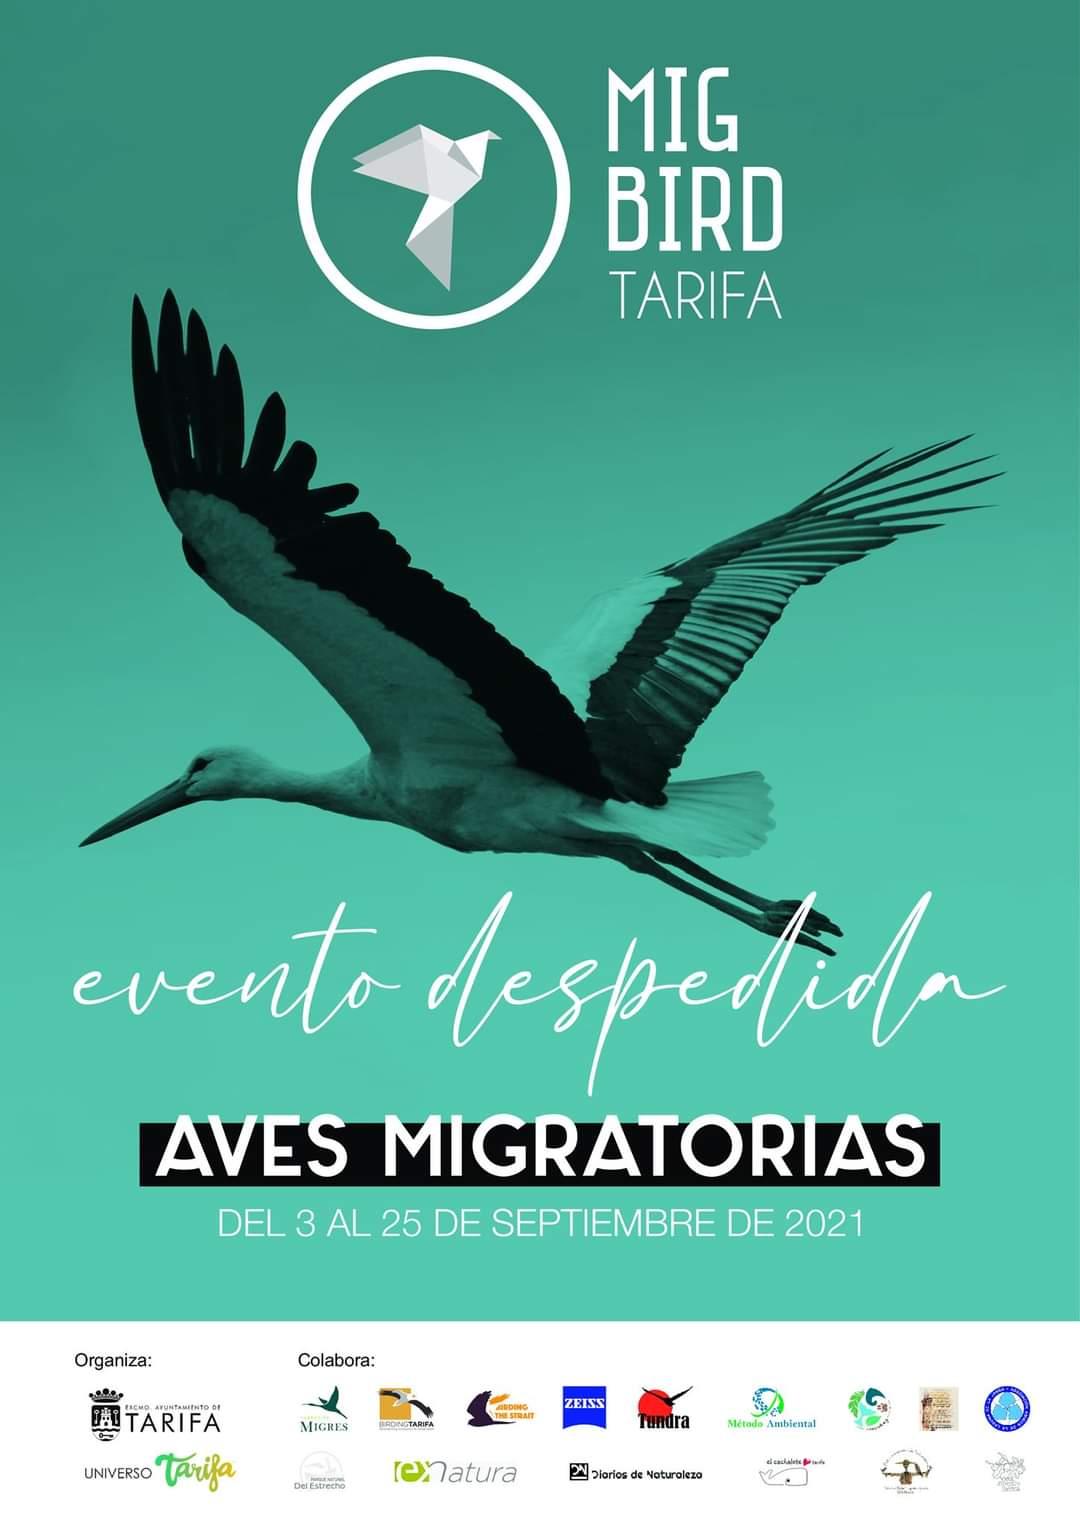 migbird aves migratorias despedida tarifa 2021